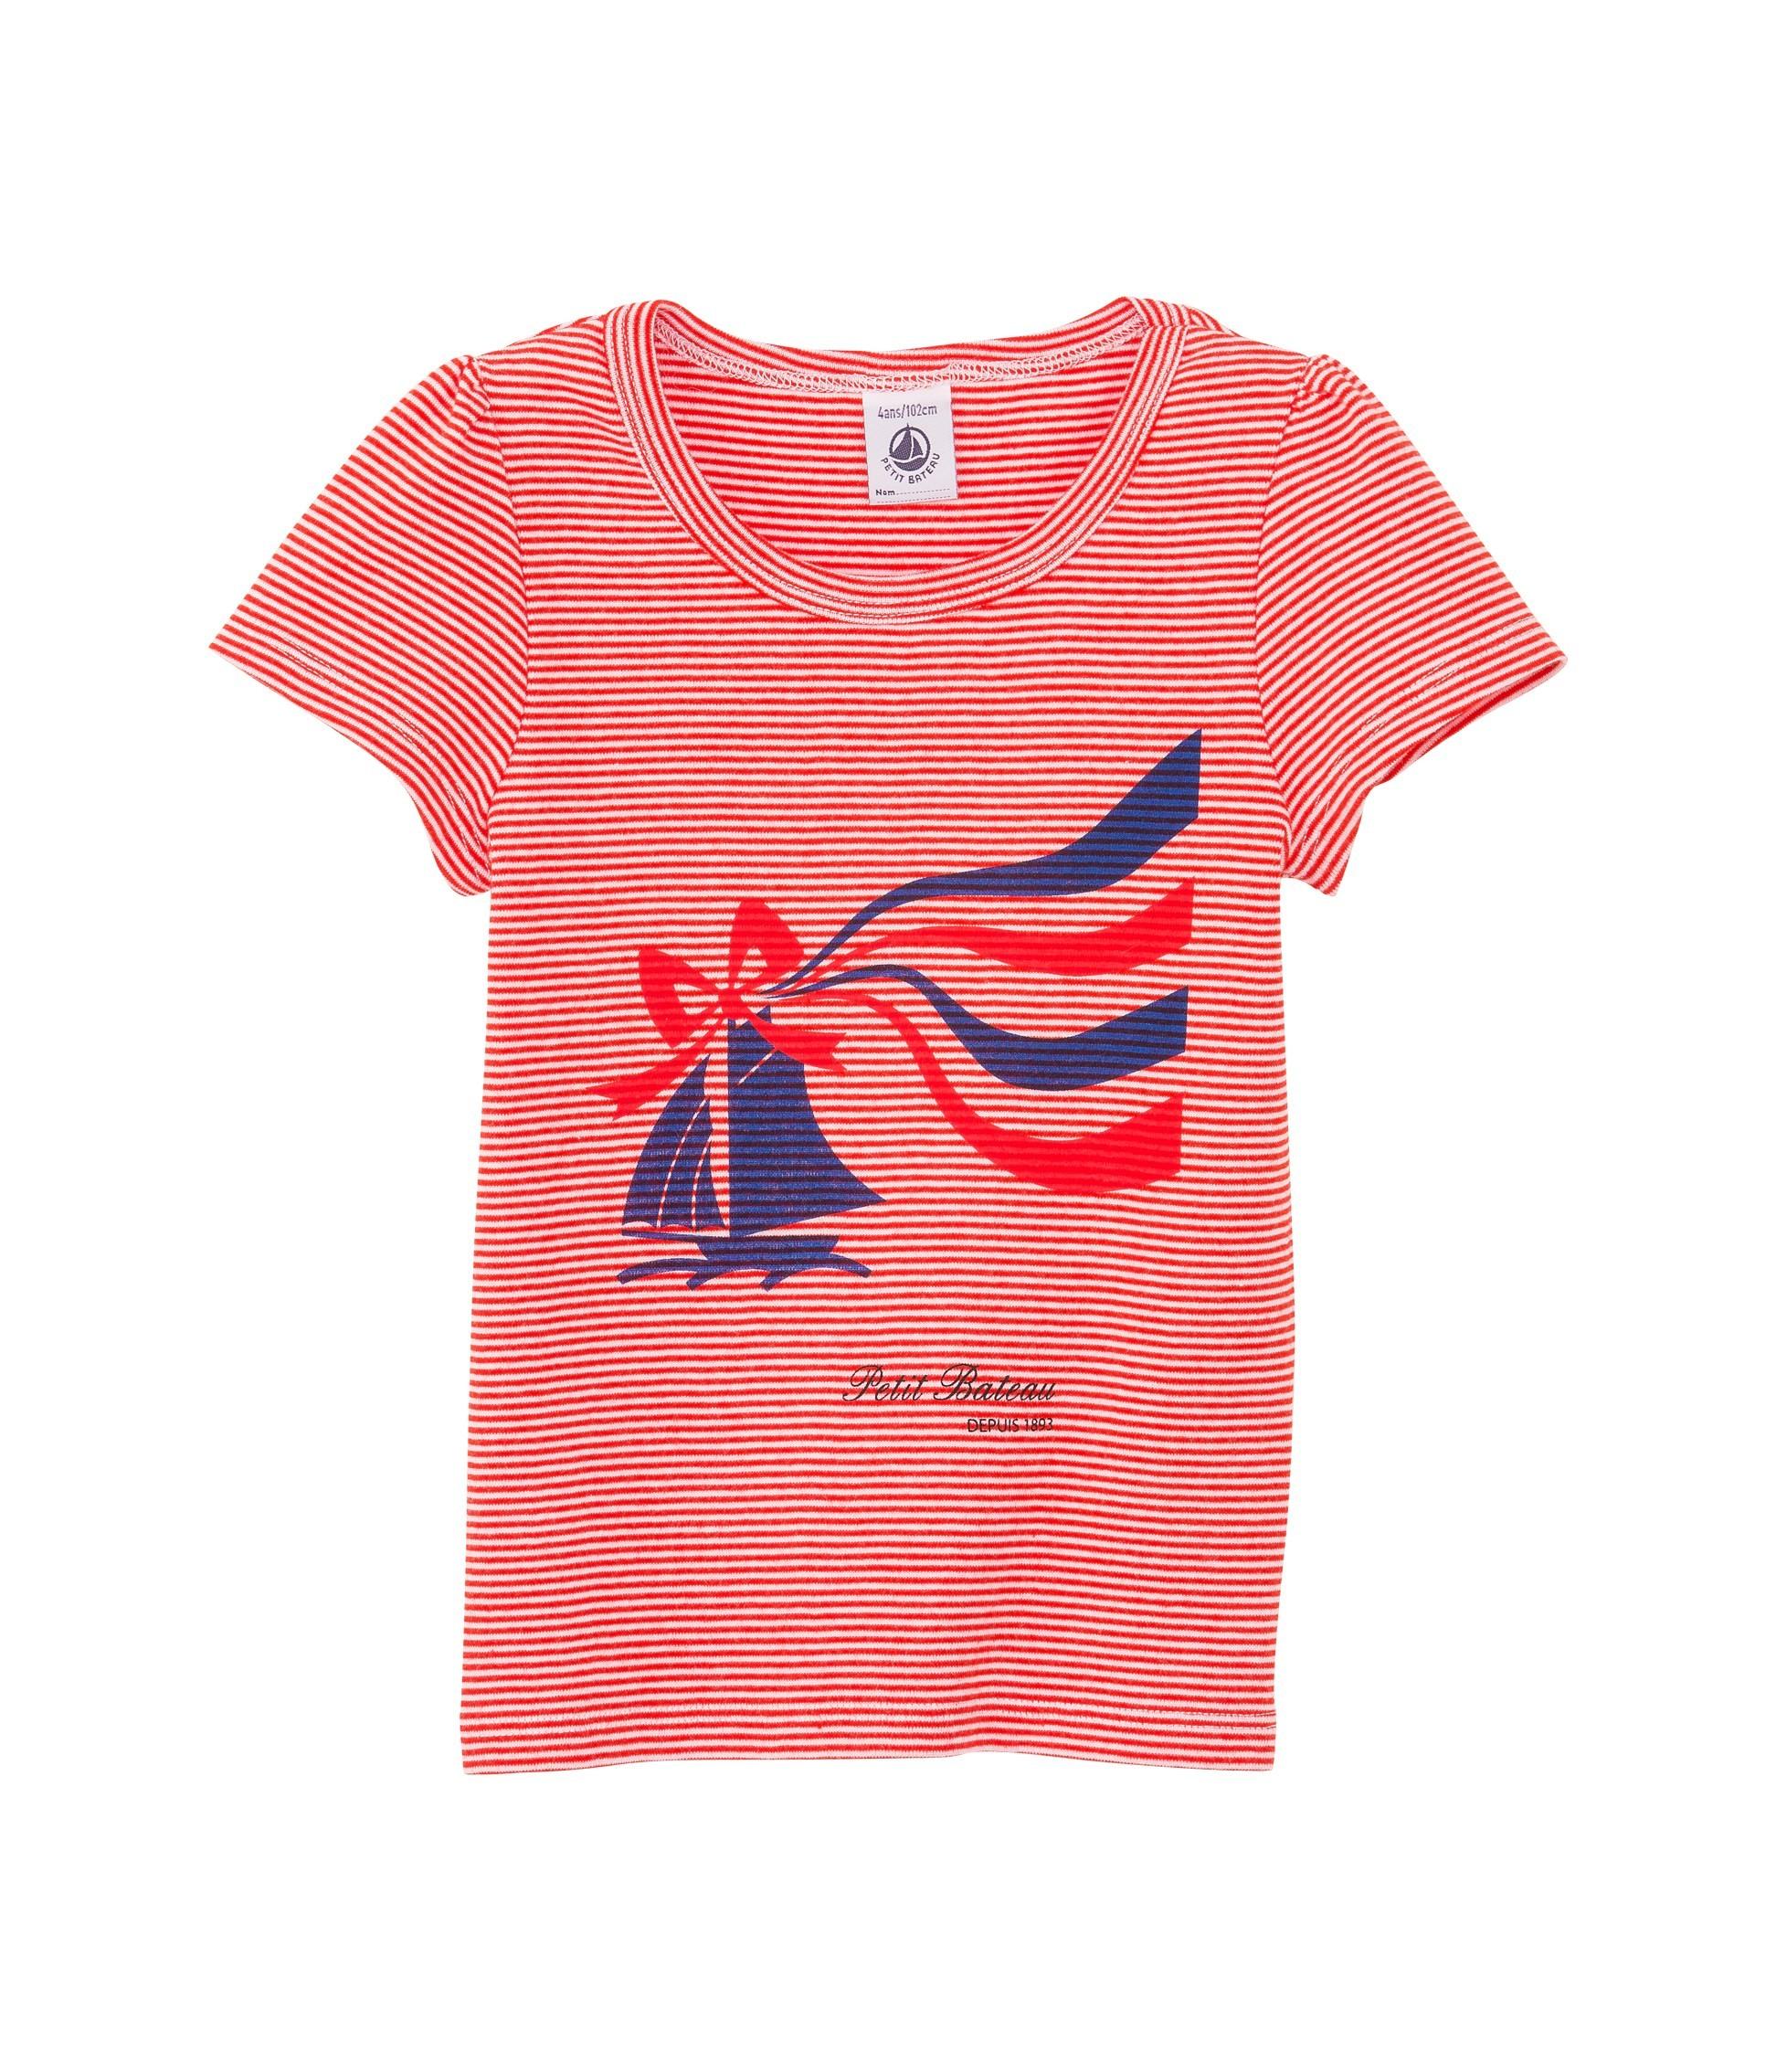 135ee086b Silk Screen Printing T Shirts Near Me – DACC